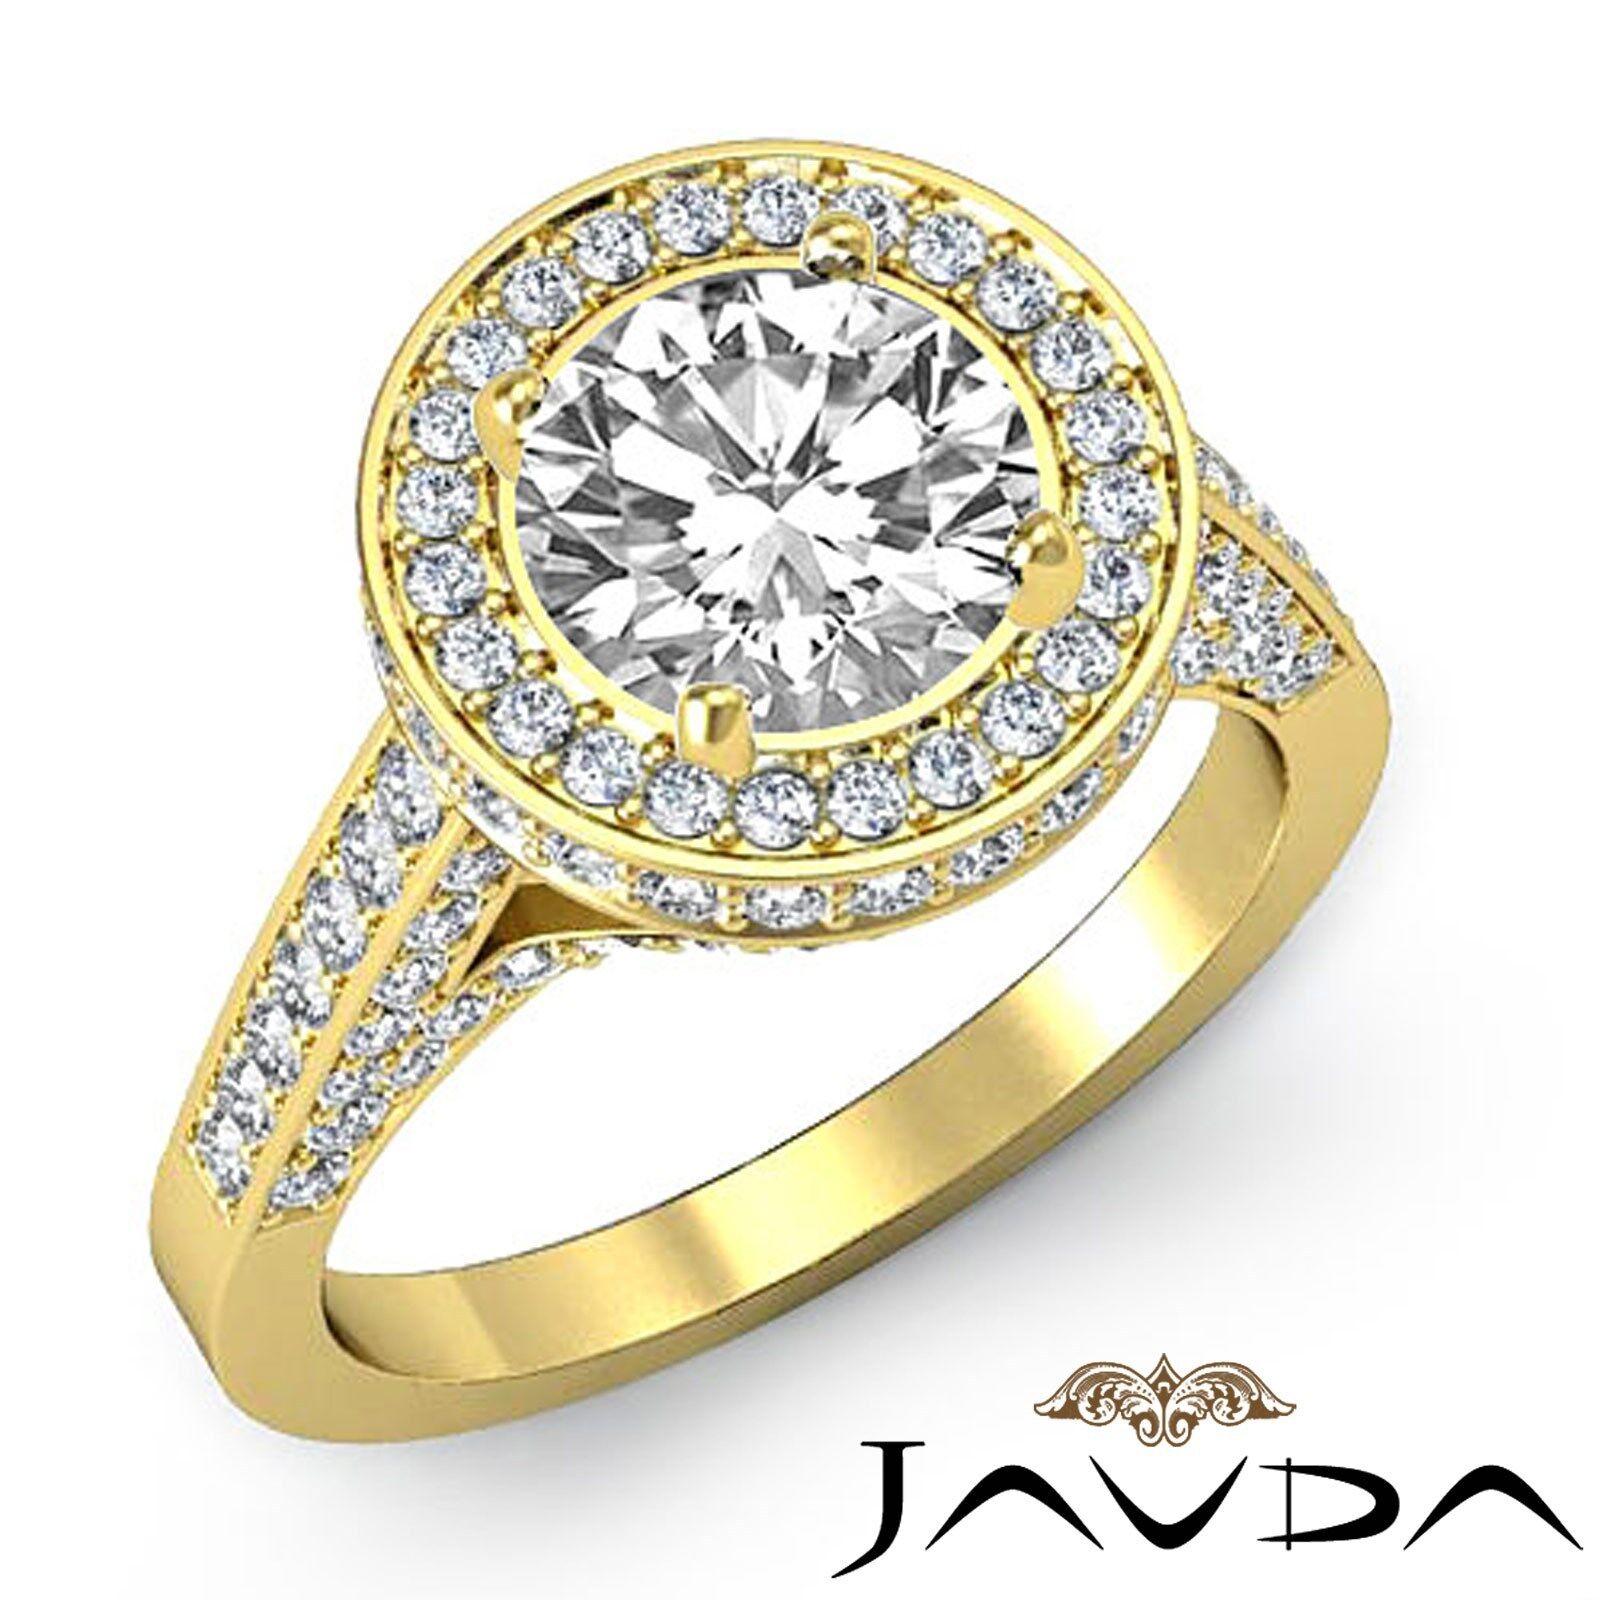 Brilliant Cut Round Diamond Engagement Halo Ring GIA H VS1 18k Yellow Gold 2.8ct